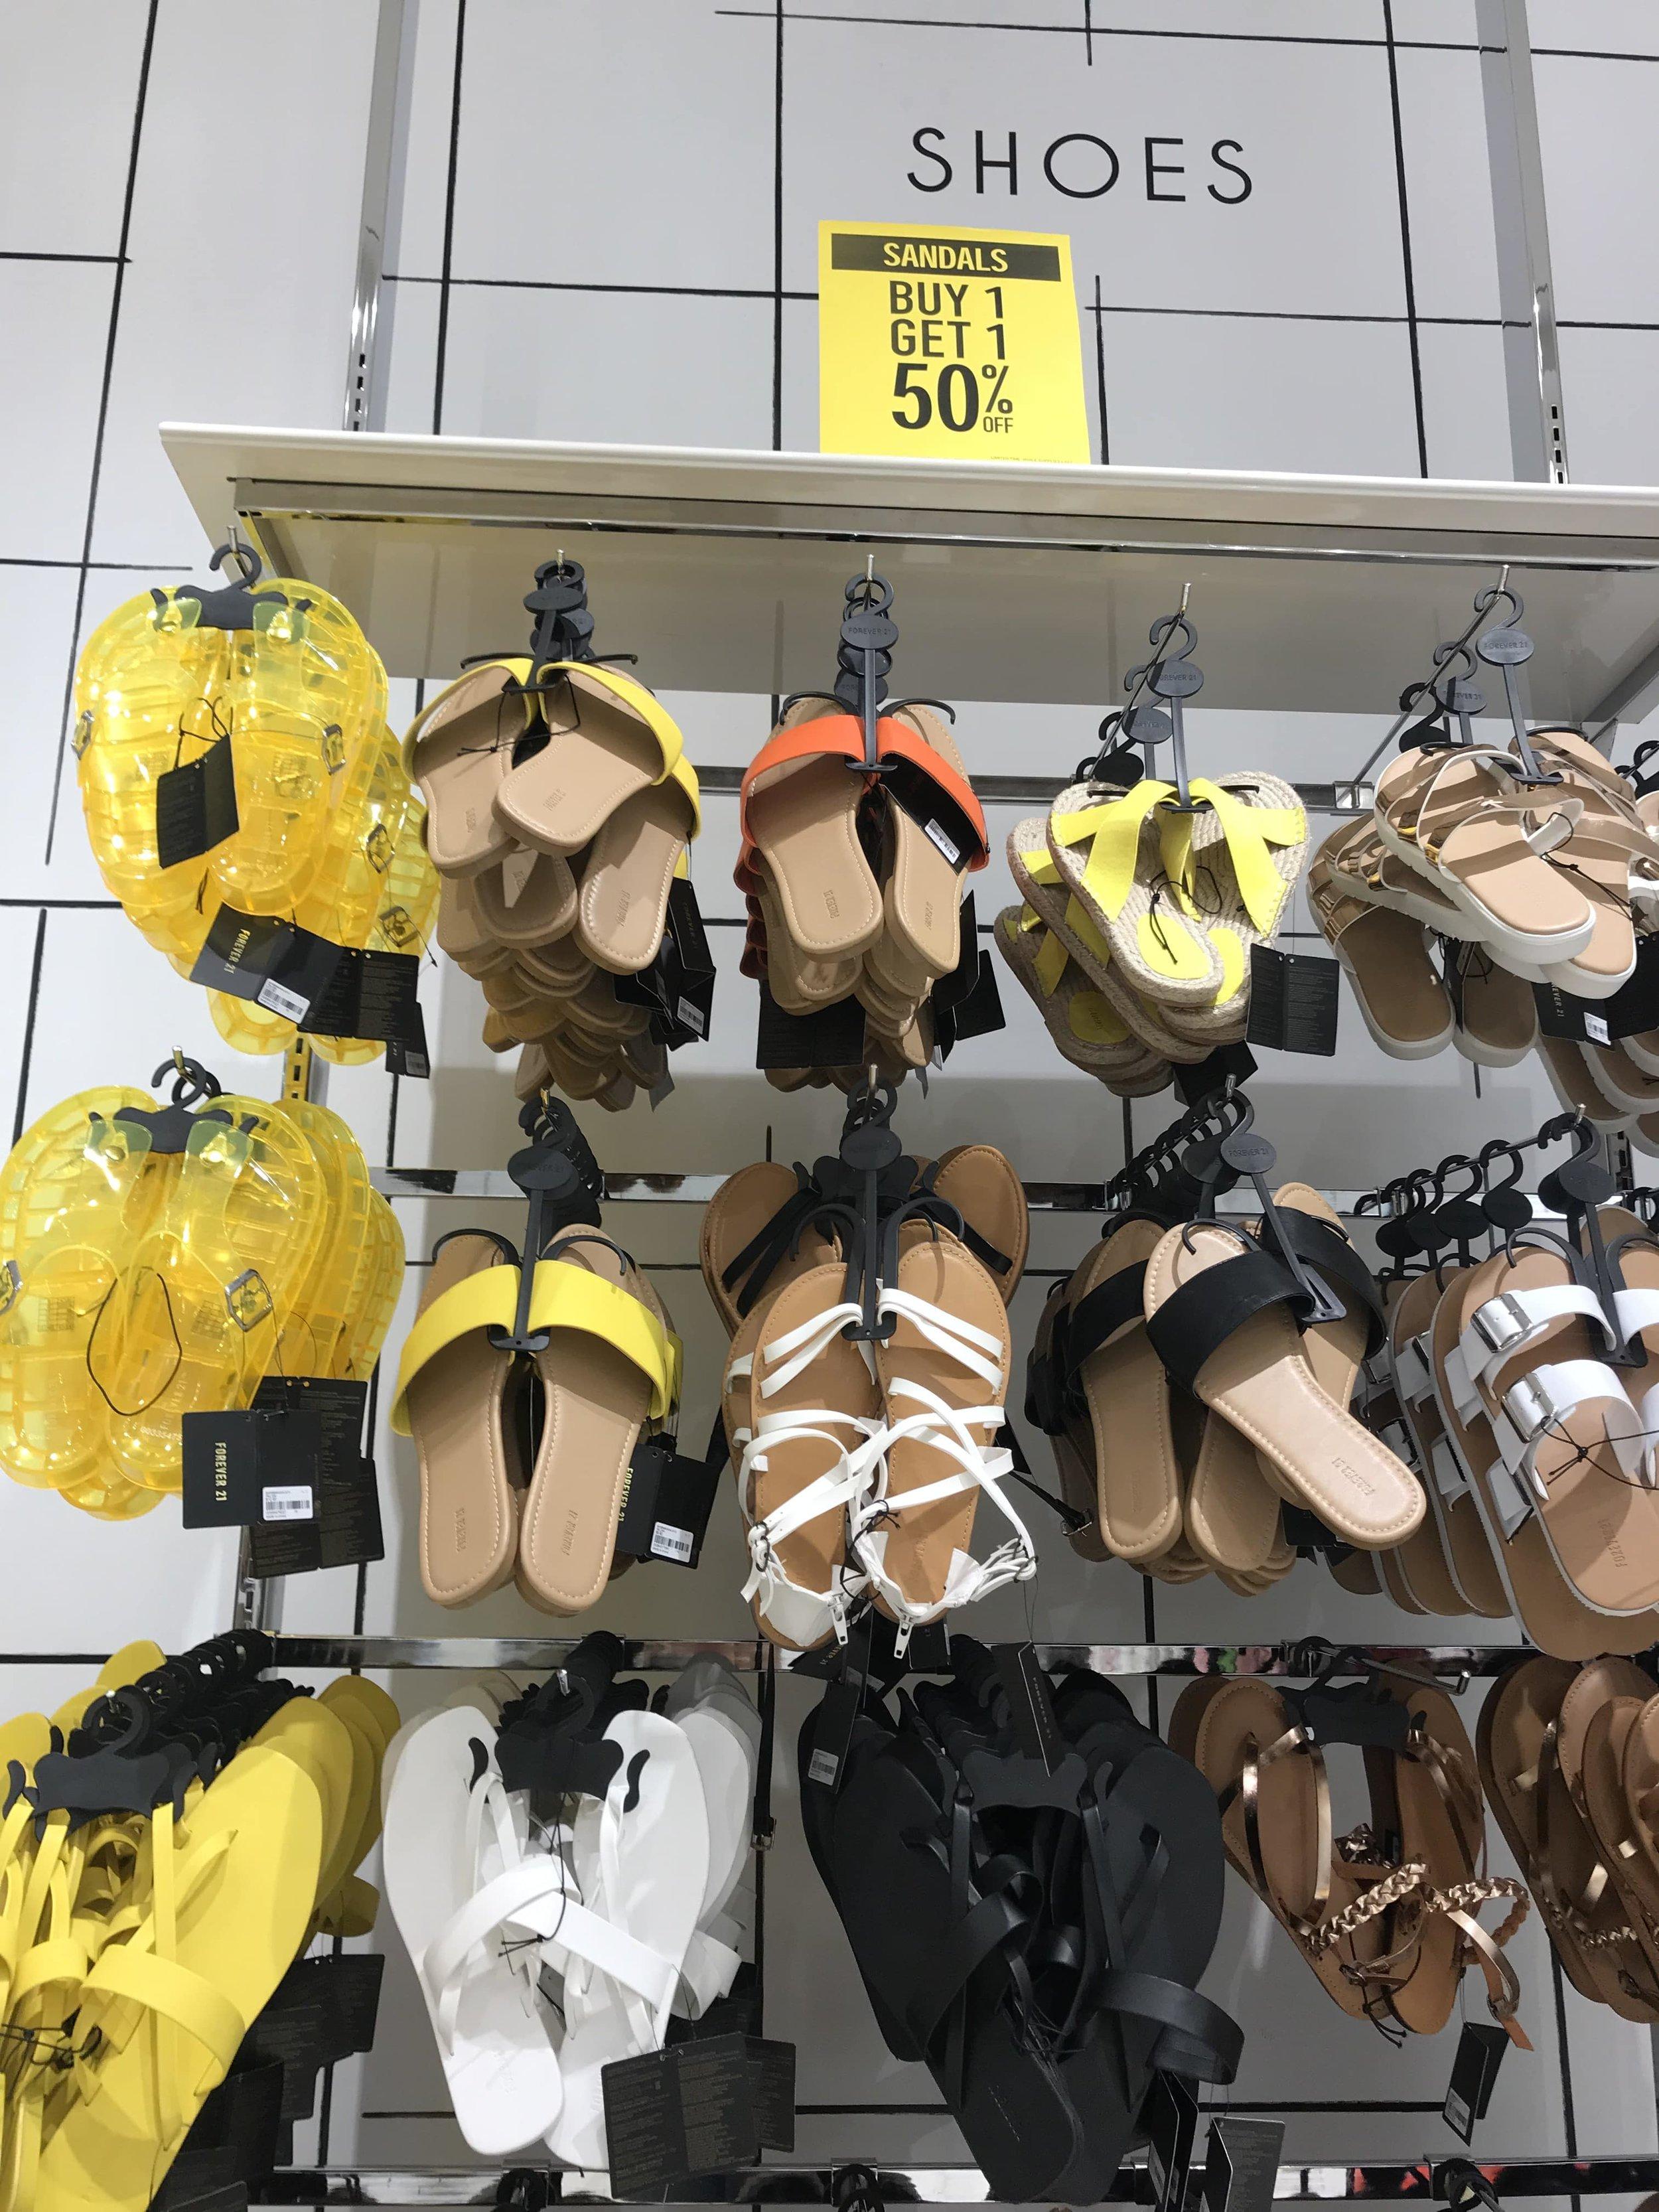 Forever 21 offer on summer sandals